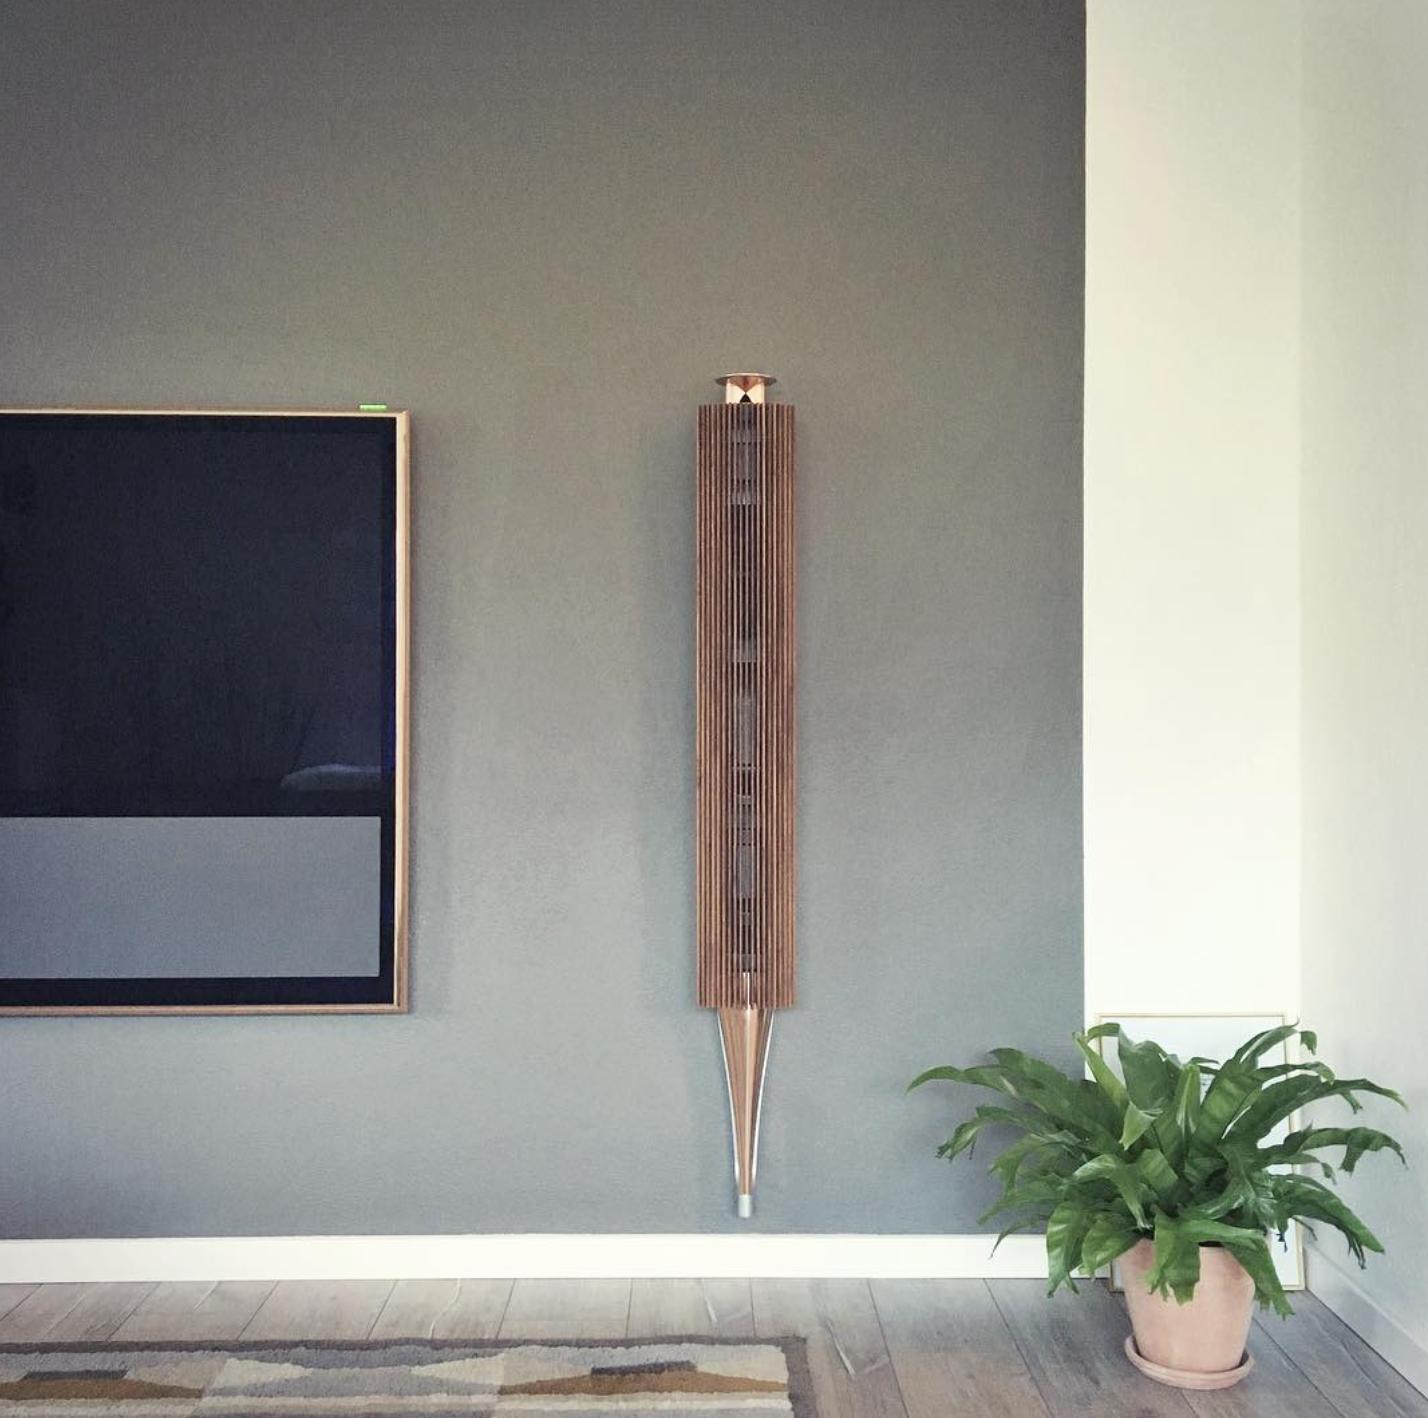 thank you casperinnleggen for sharing your b o home on. Black Bedroom Furniture Sets. Home Design Ideas